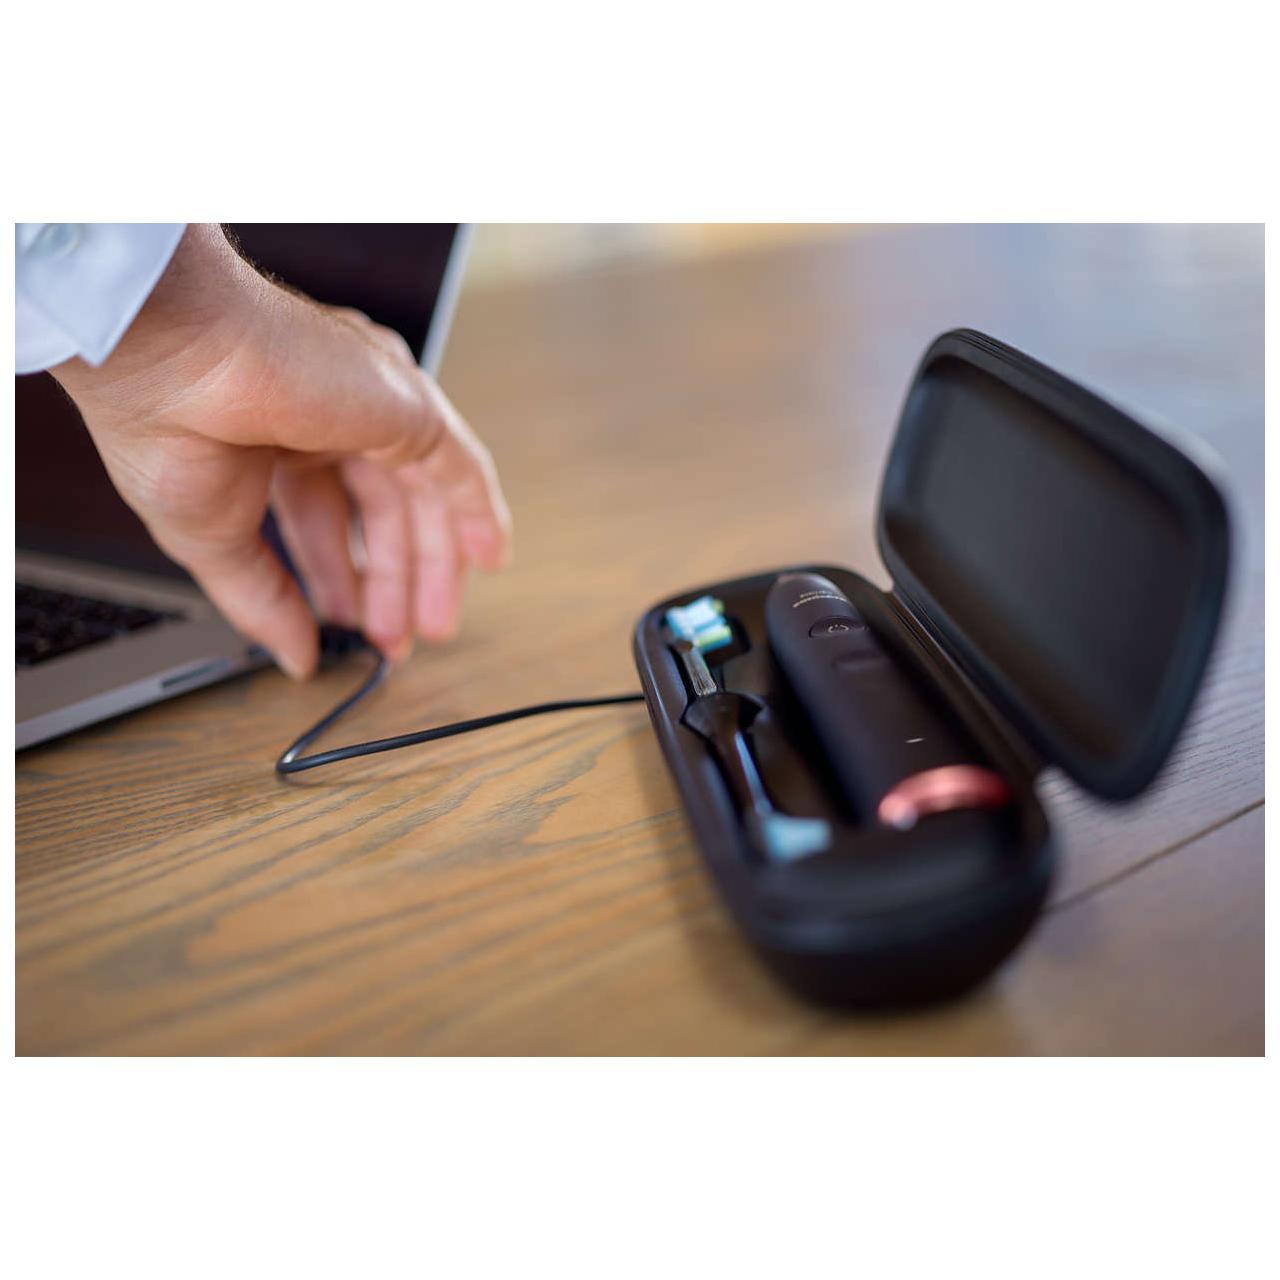 Periuta de dinti Philips Sonicare DiamondClean Smart HX9954/57, 3 capete de periere, Bluetooth, Tehnologie BrushPacer si SmarTimer, Senzor de presiune, Albastru